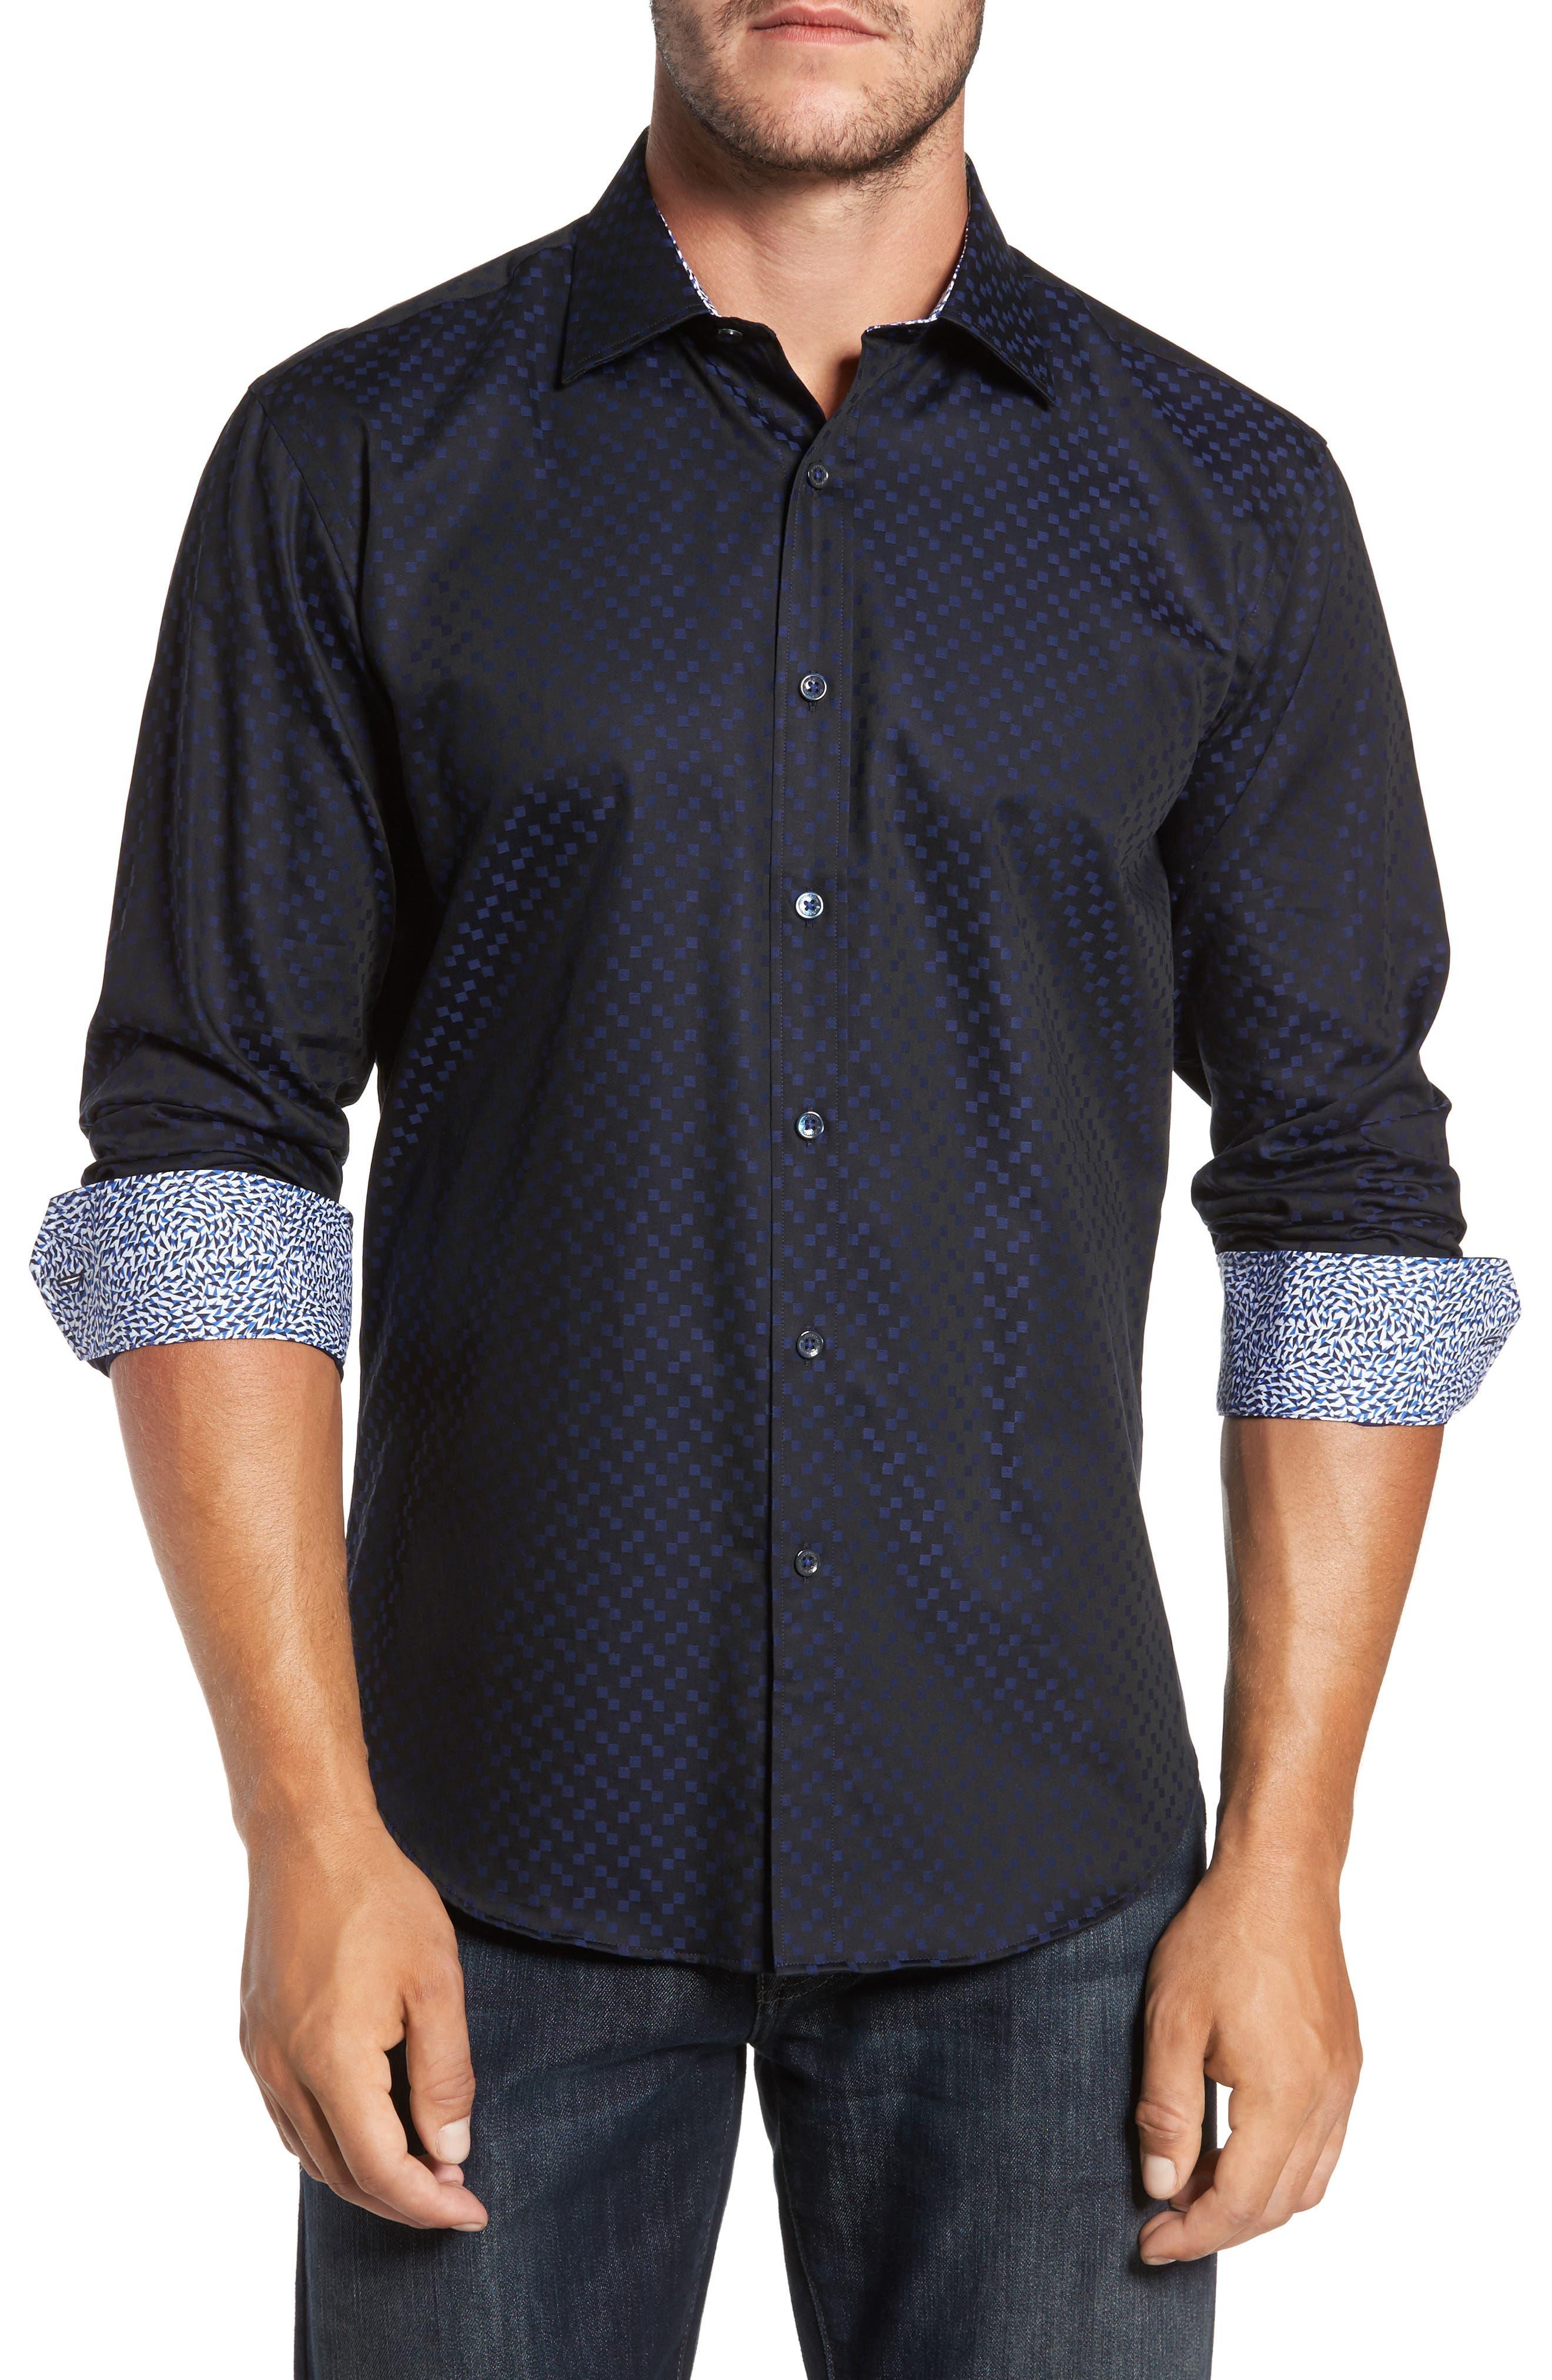 Main Image - Bugatchi Trim Fit Geo Jacquard Sport Shirt